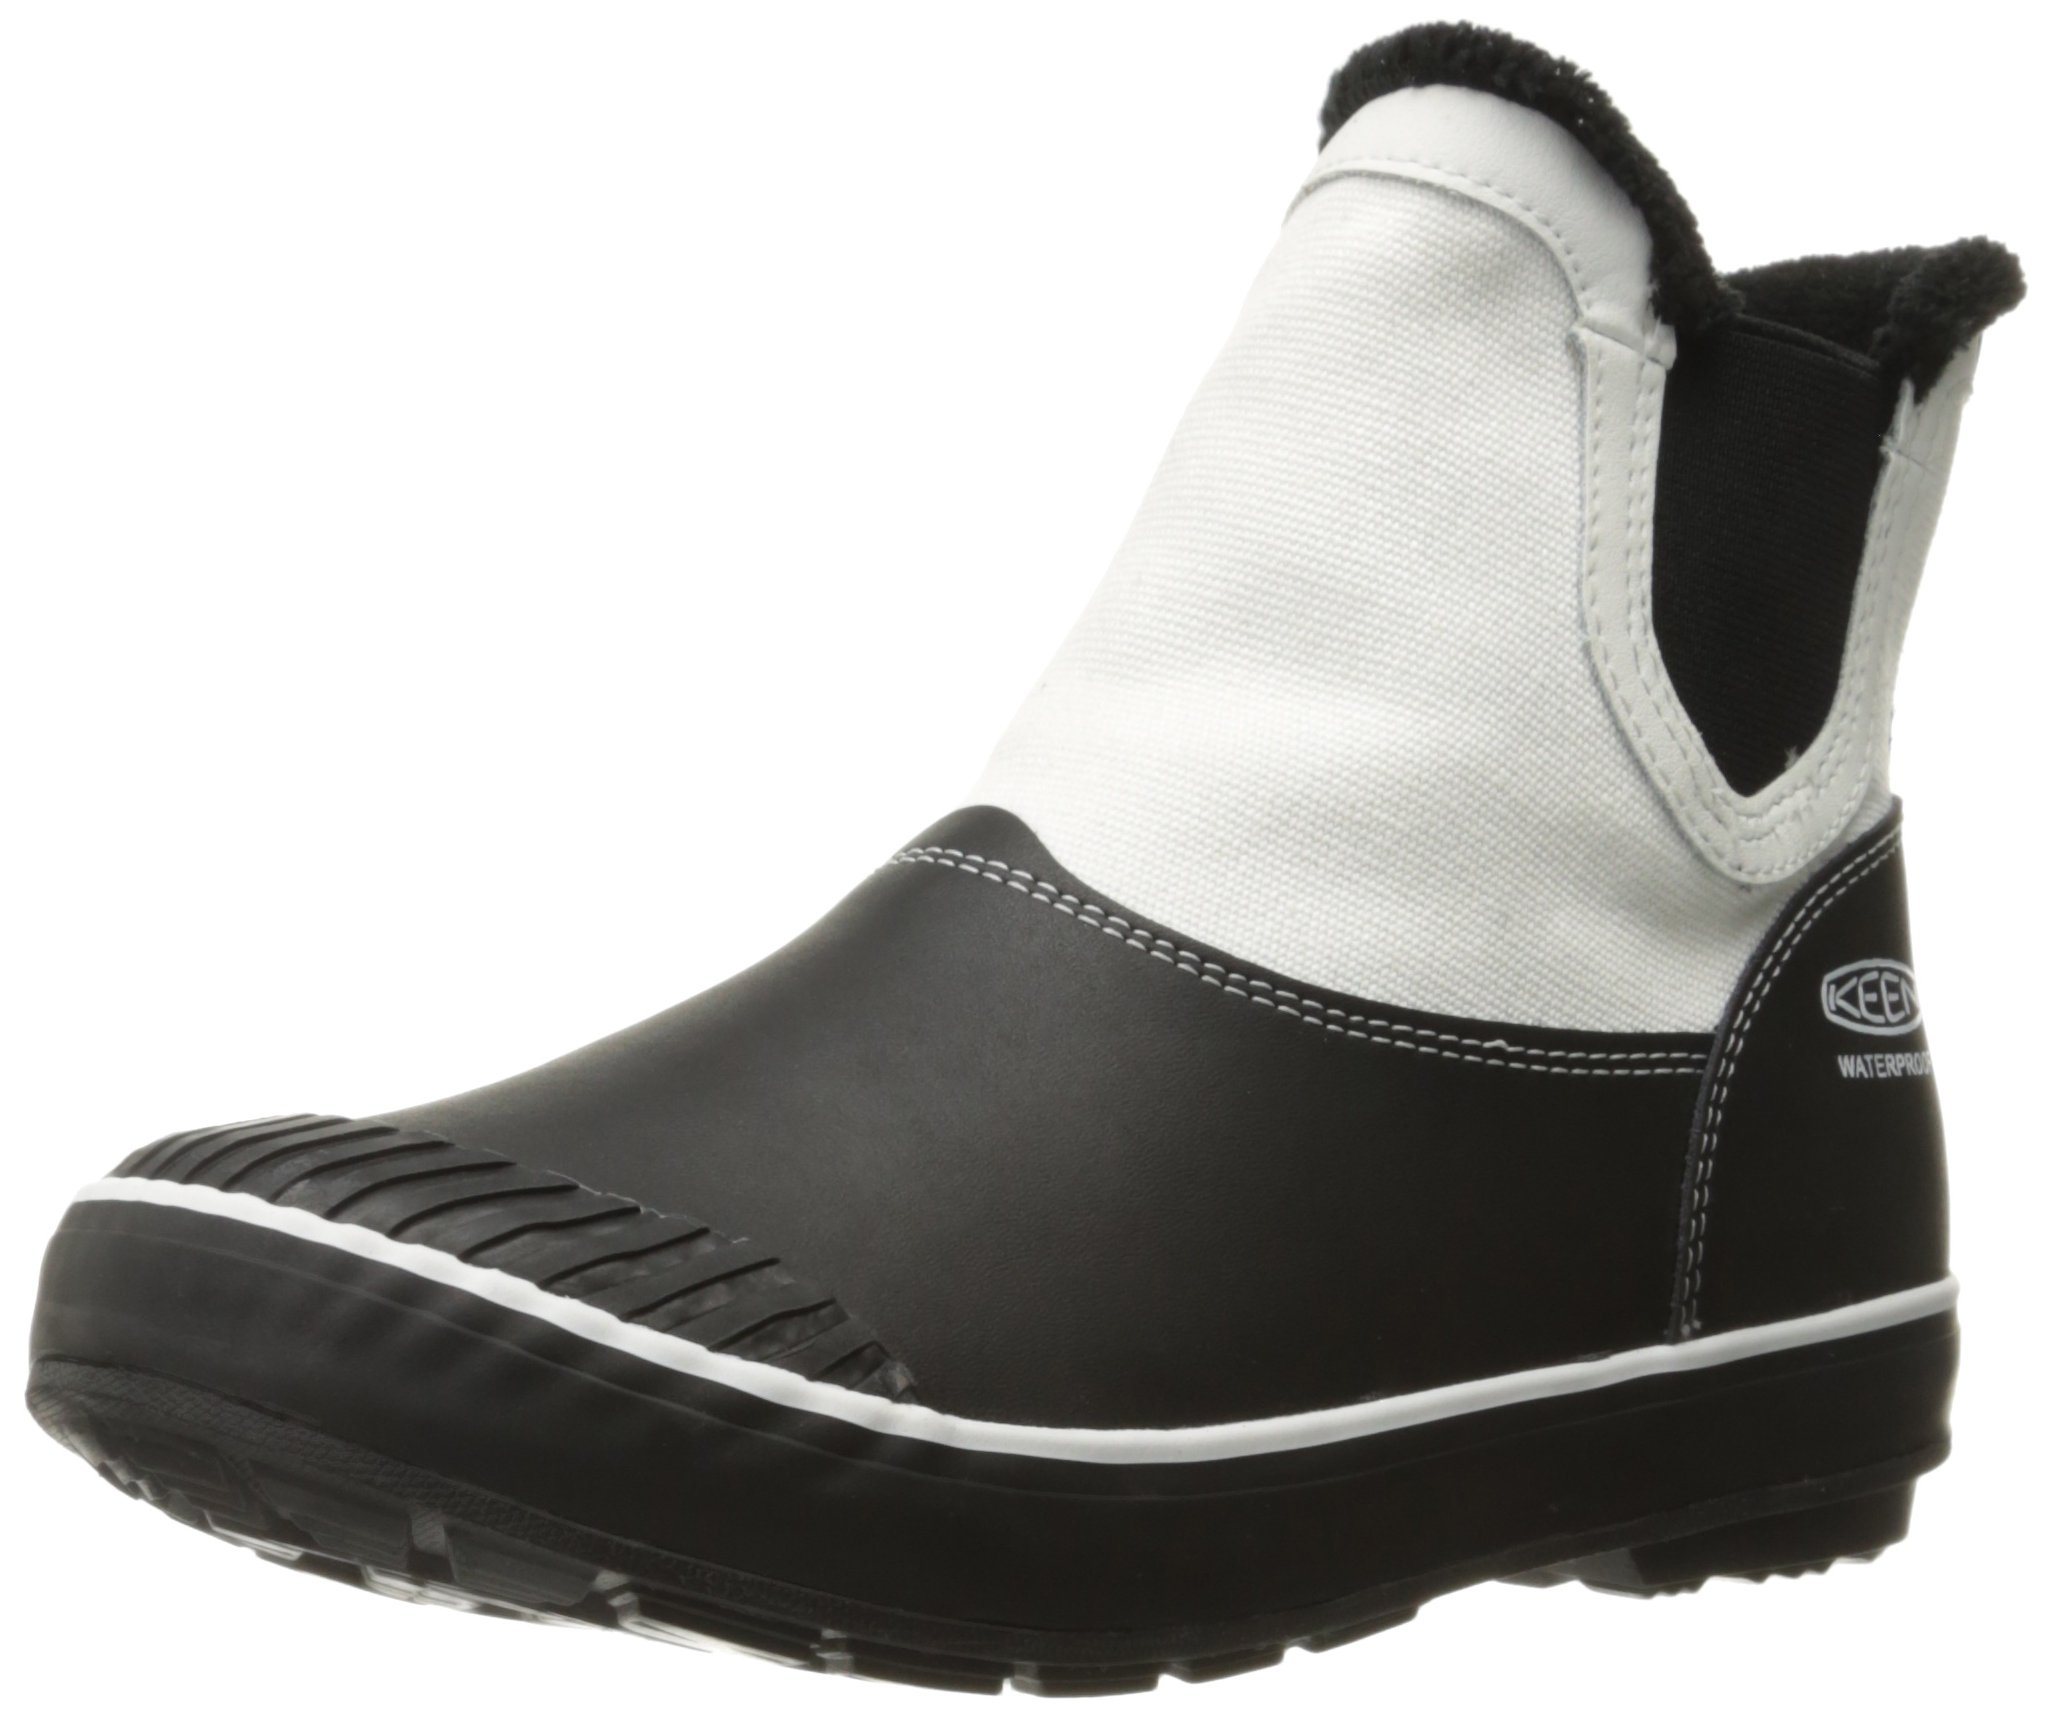 KEEN Women's Elsa Chelsea Waterproof Boot, Star White/Black/Chocolate/Bronze, 7.5 M US